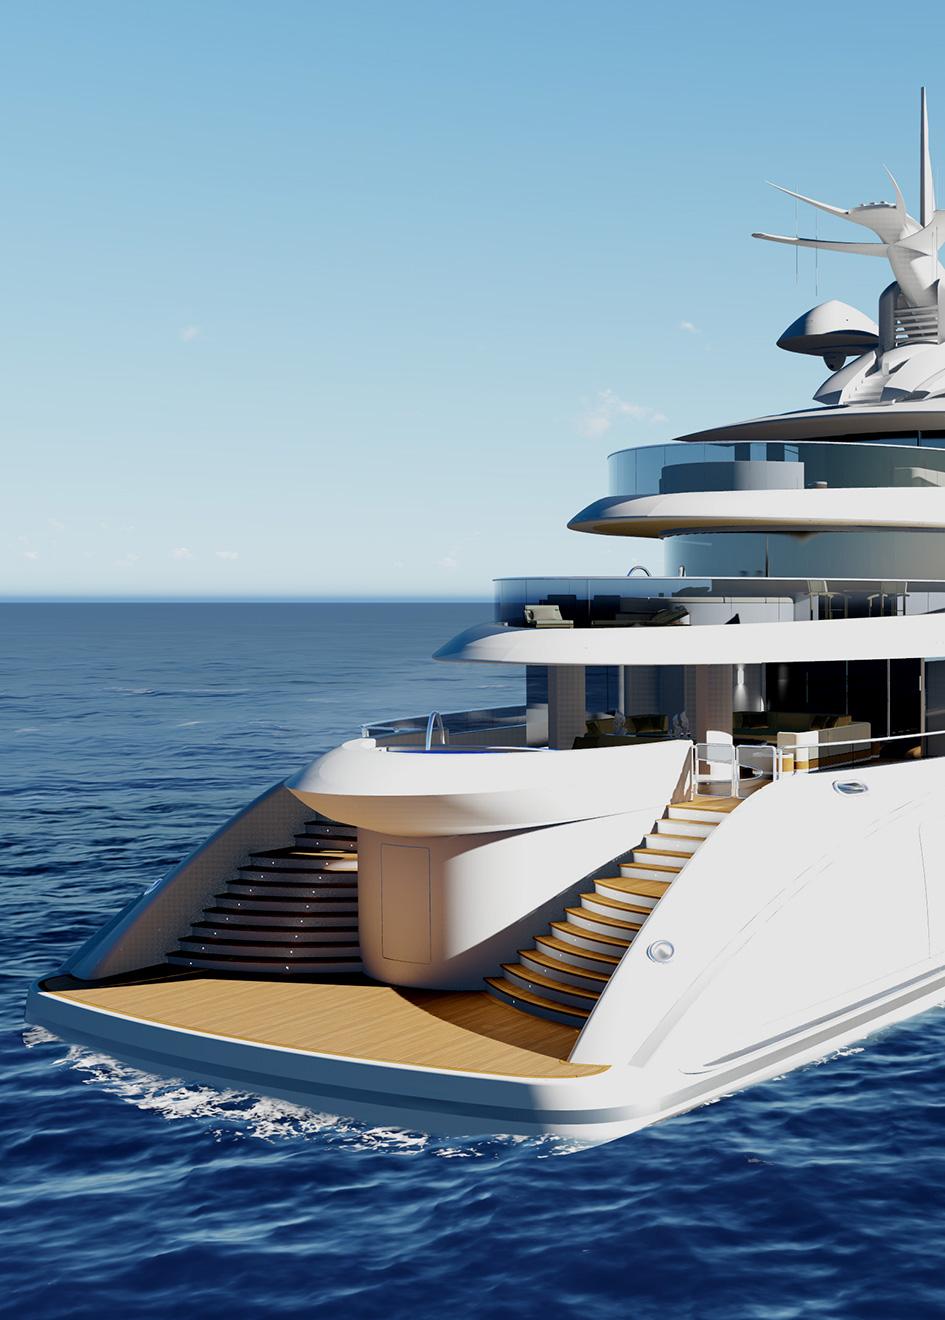 the-transom-of-90-metre-fincantieri-super-yacht-concept-sundance